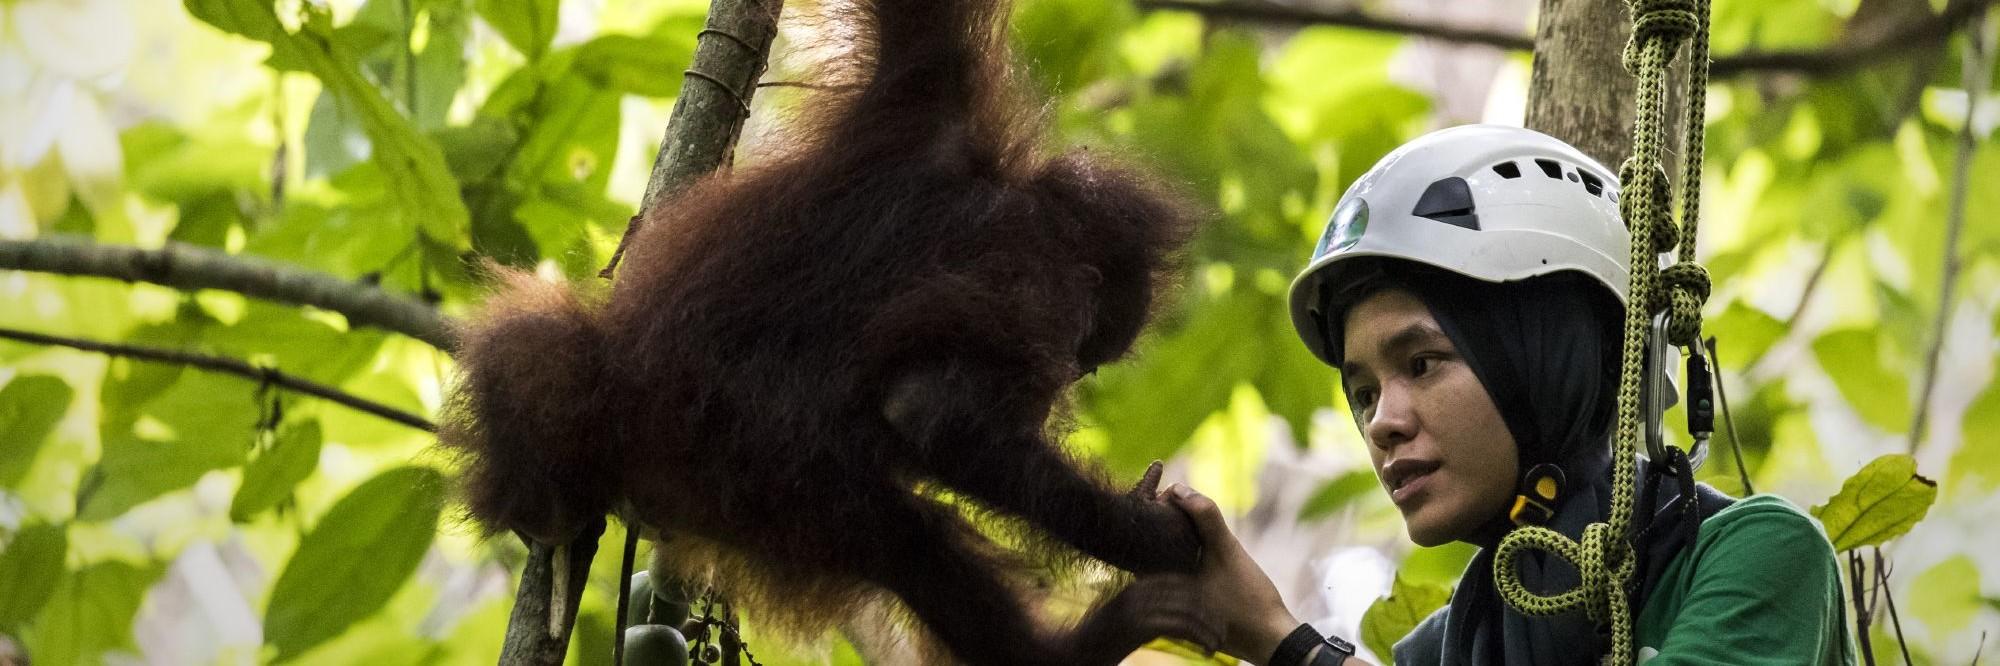 Orangutan climbing lessons with caretaker